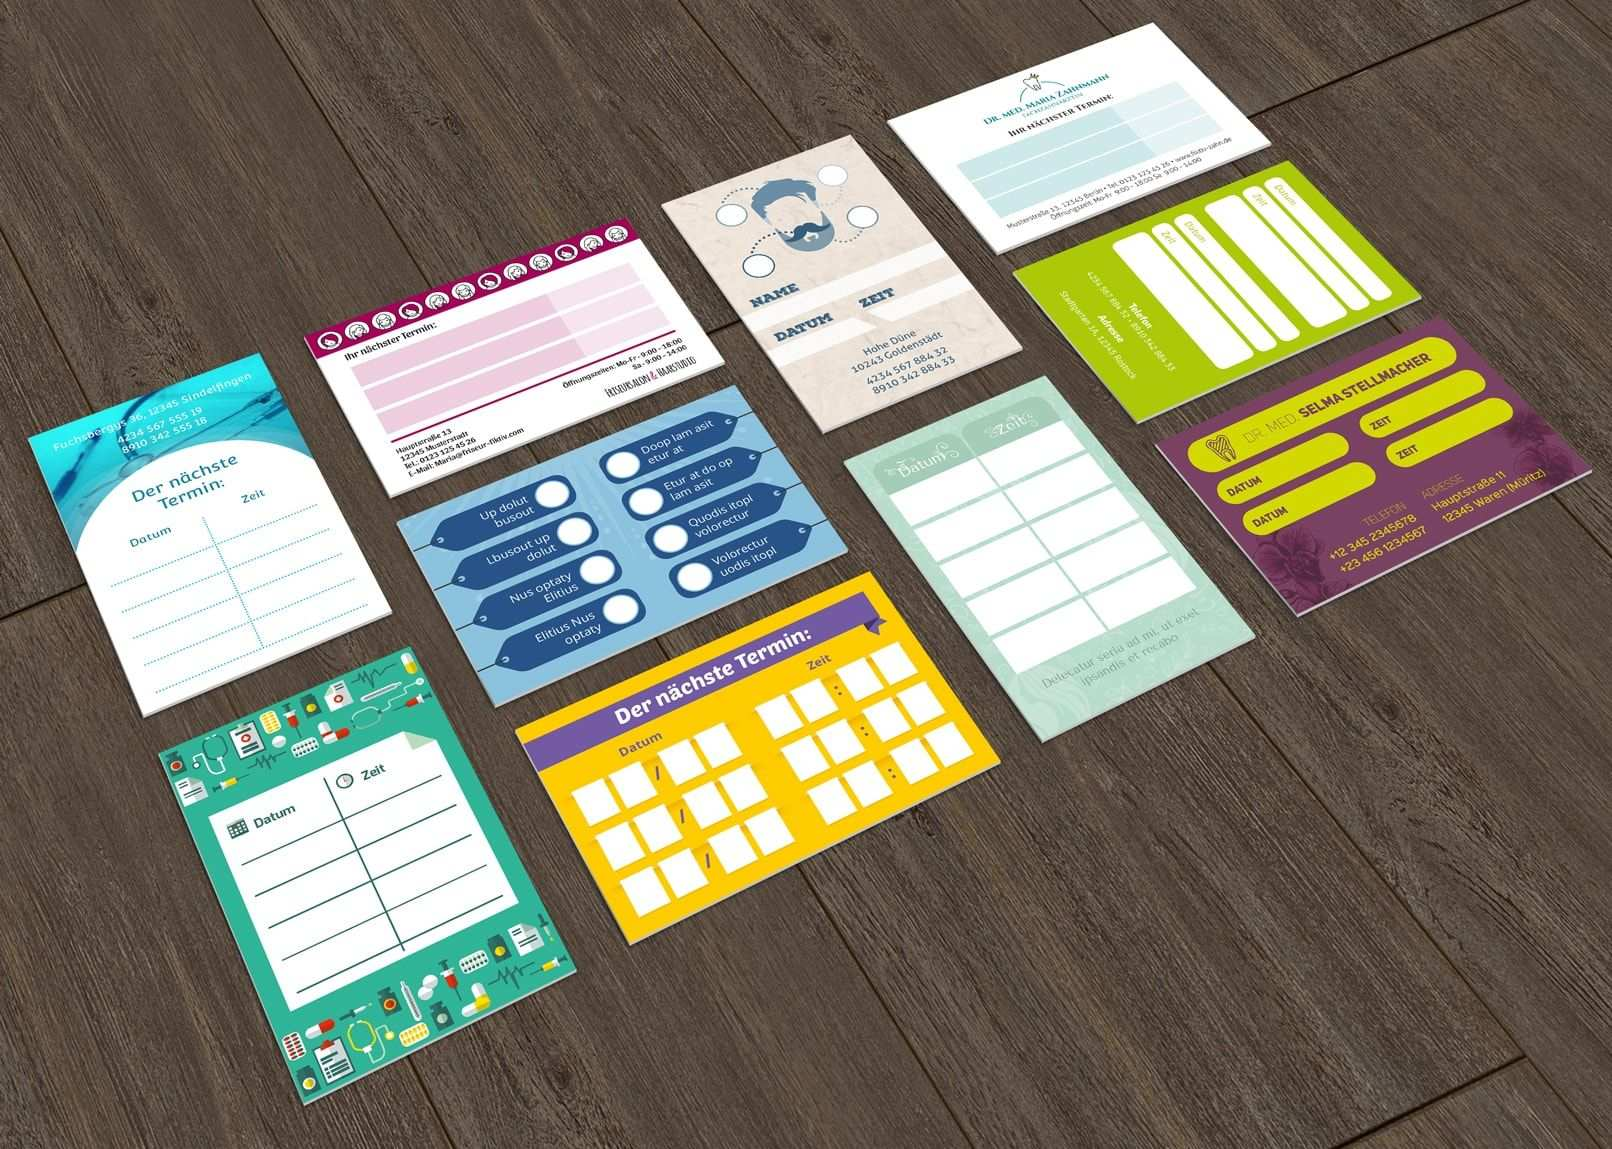 Vorlagen Stempelkarten Terminkarten Bonuskarten Erstellen